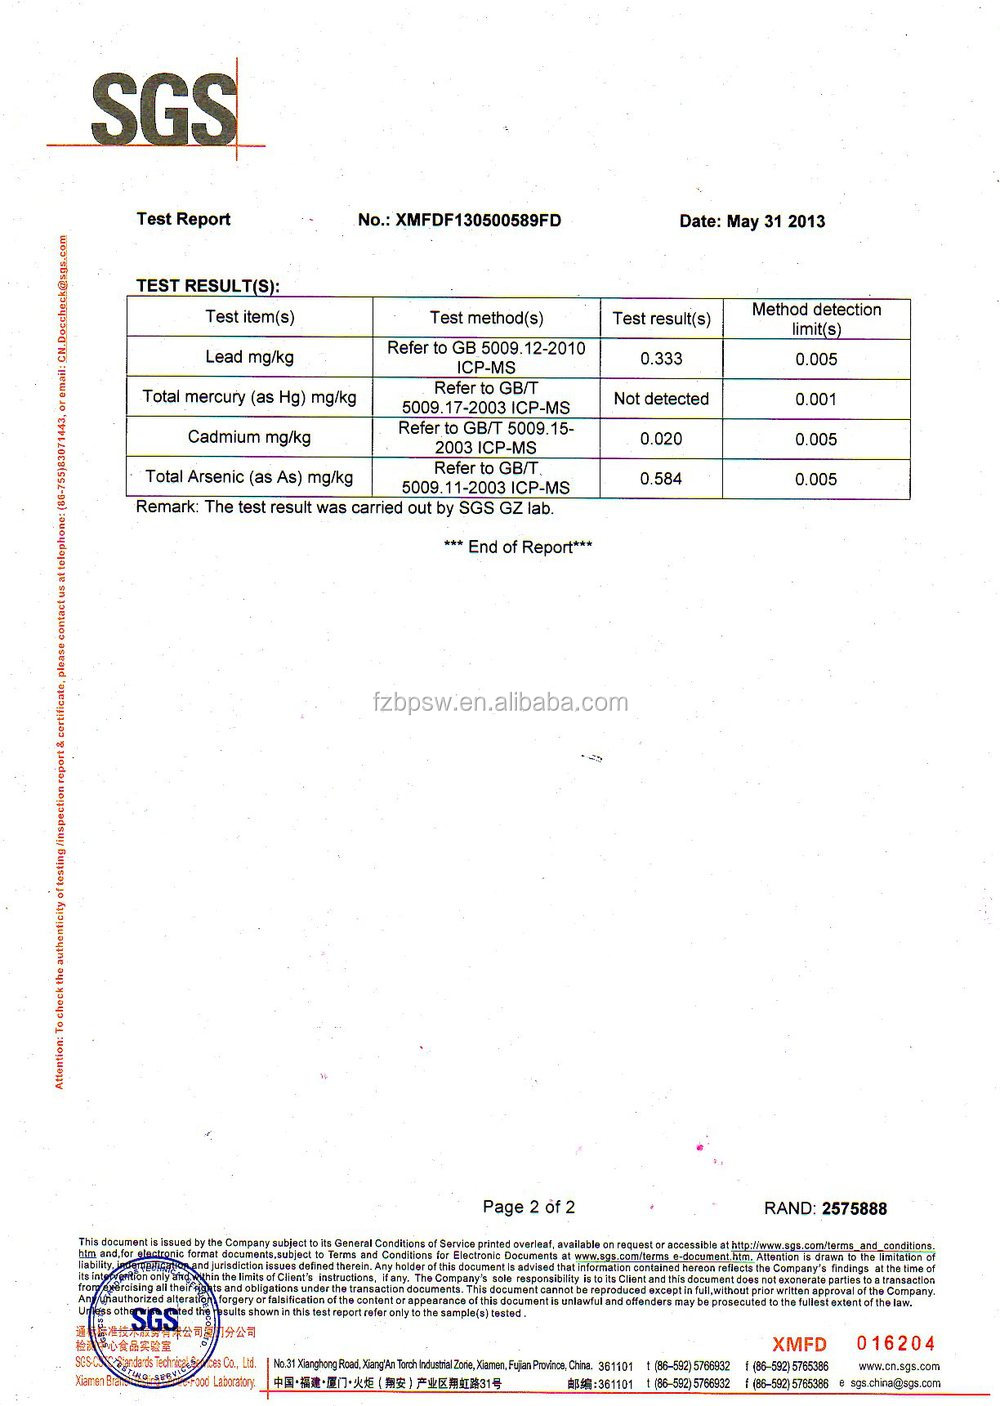 SGS test report2.jpg